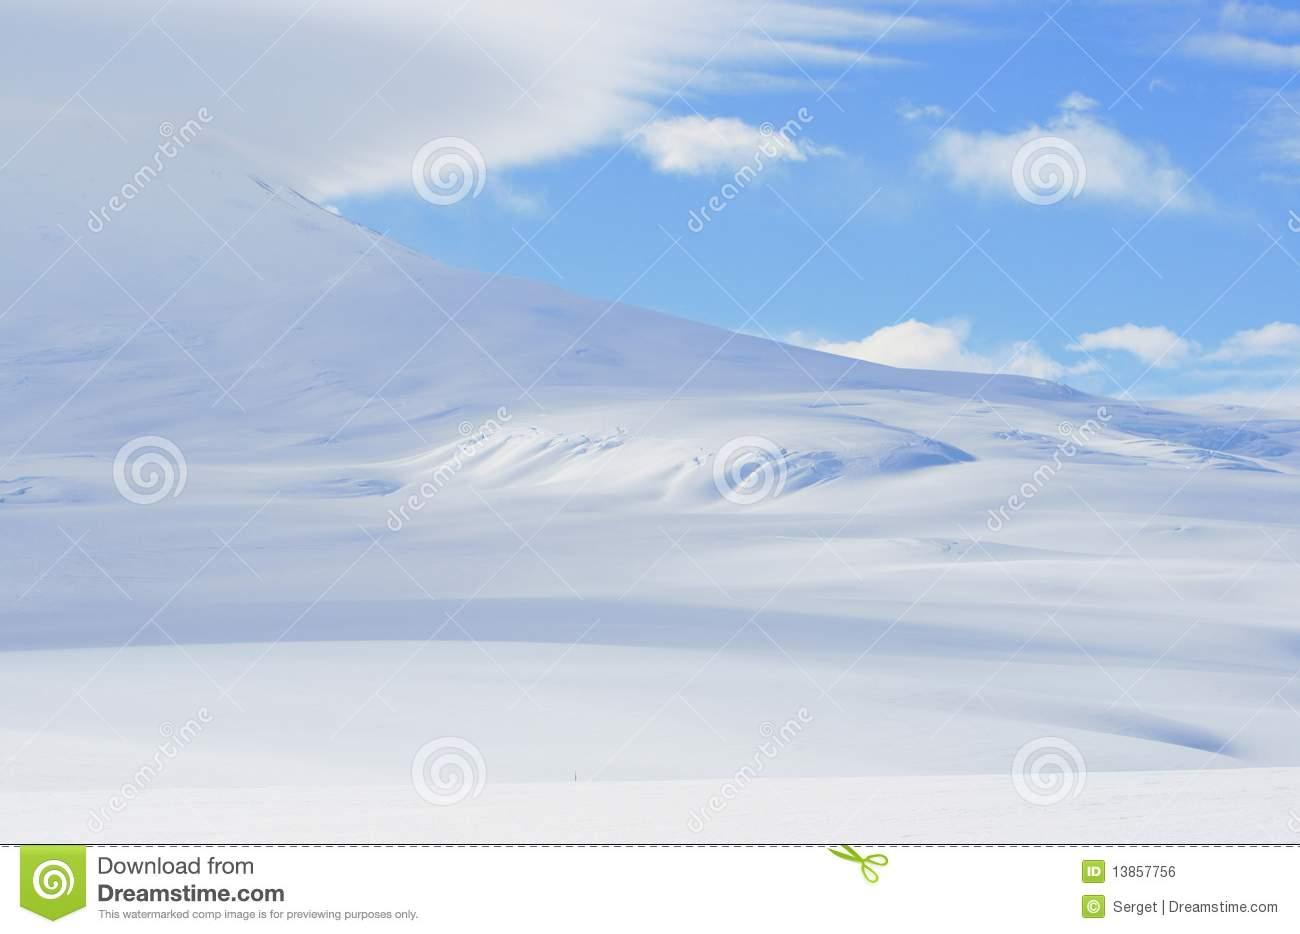 Mount Erebus clipart #13, Download drawings